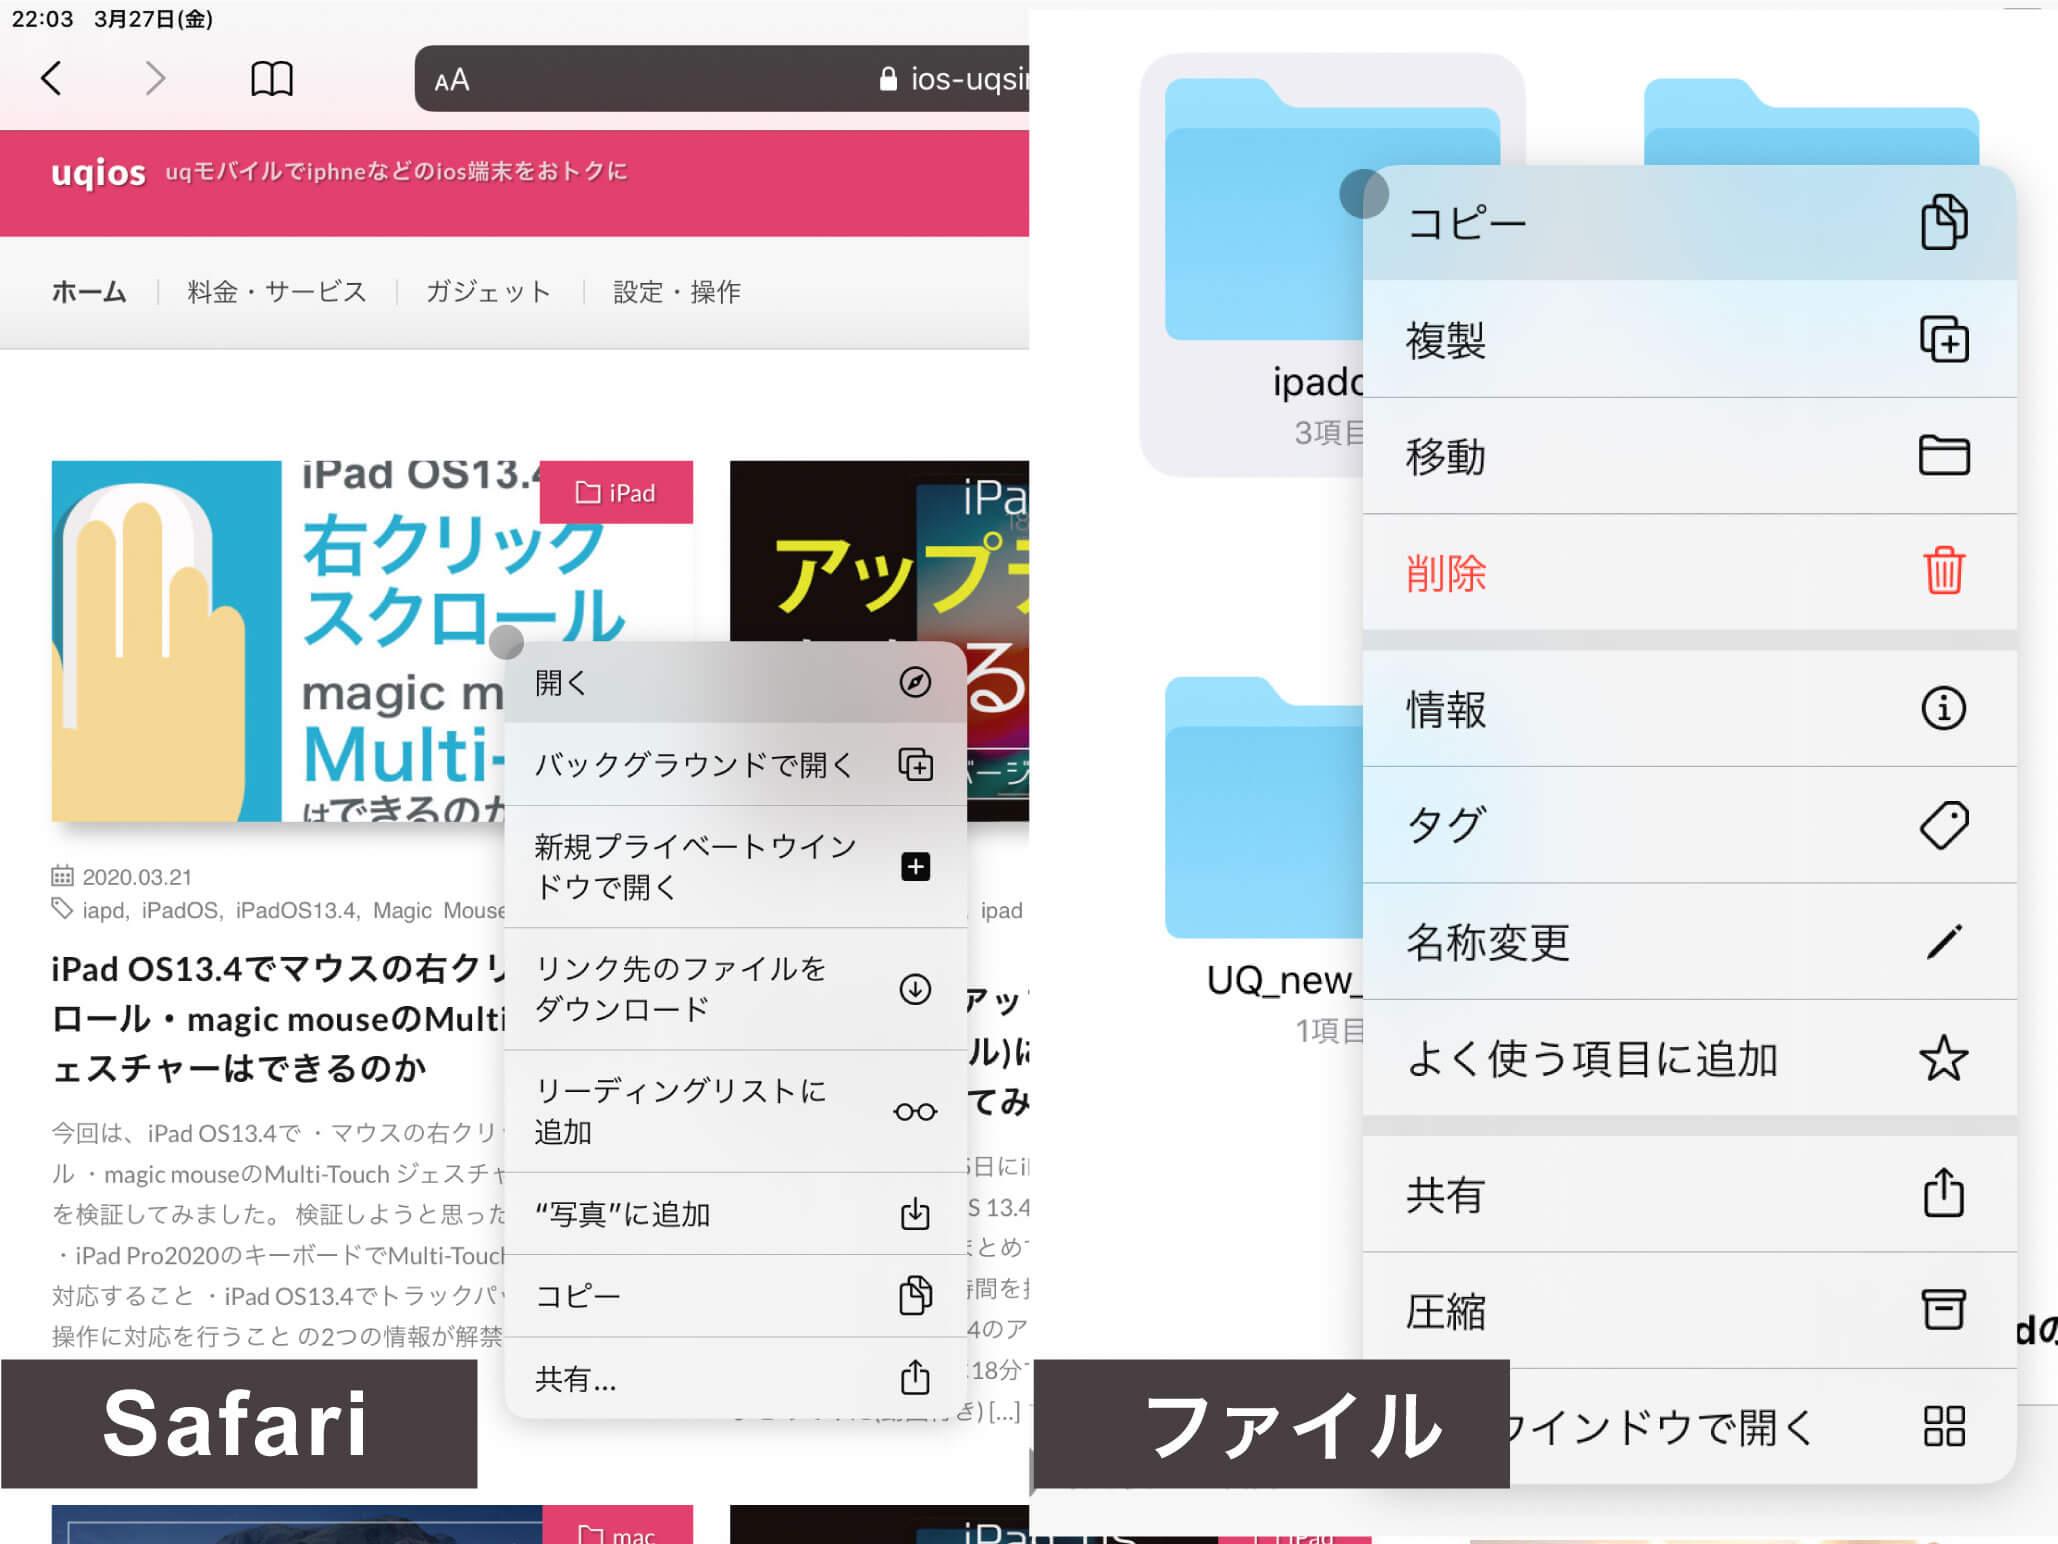 safariとファイルアプリの右クリック(副ボタン)で表示される項目